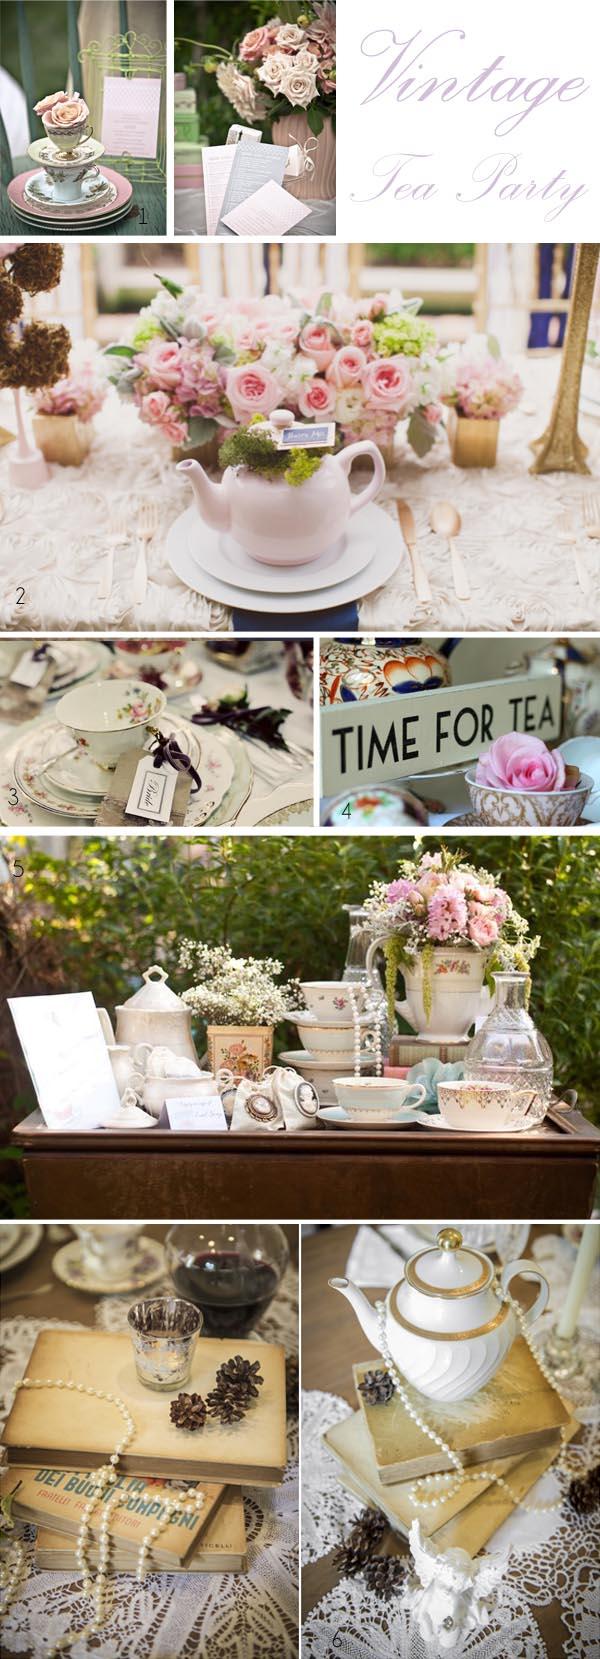 Vintage Wedding Ideas Vintage Wedding Ideas Decorations For Sale